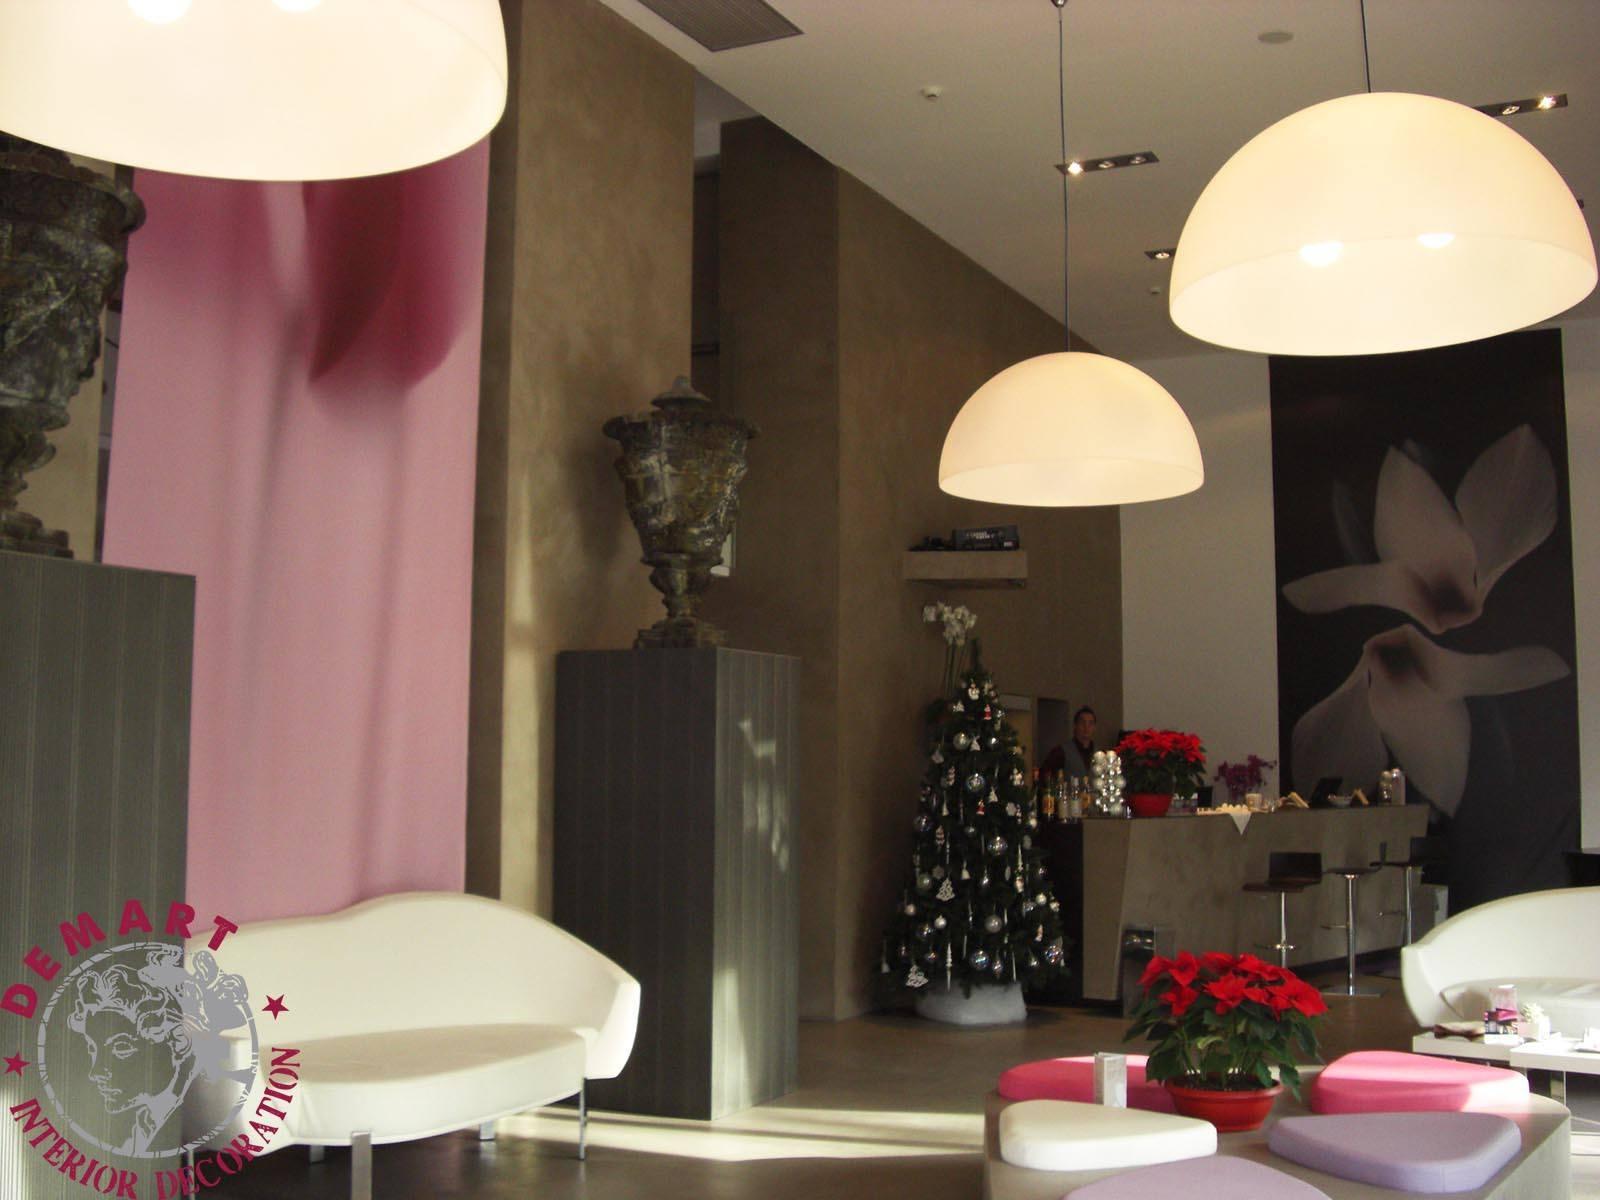 tappezzeria-decorativa-stampa-digitale-diretta-hotel